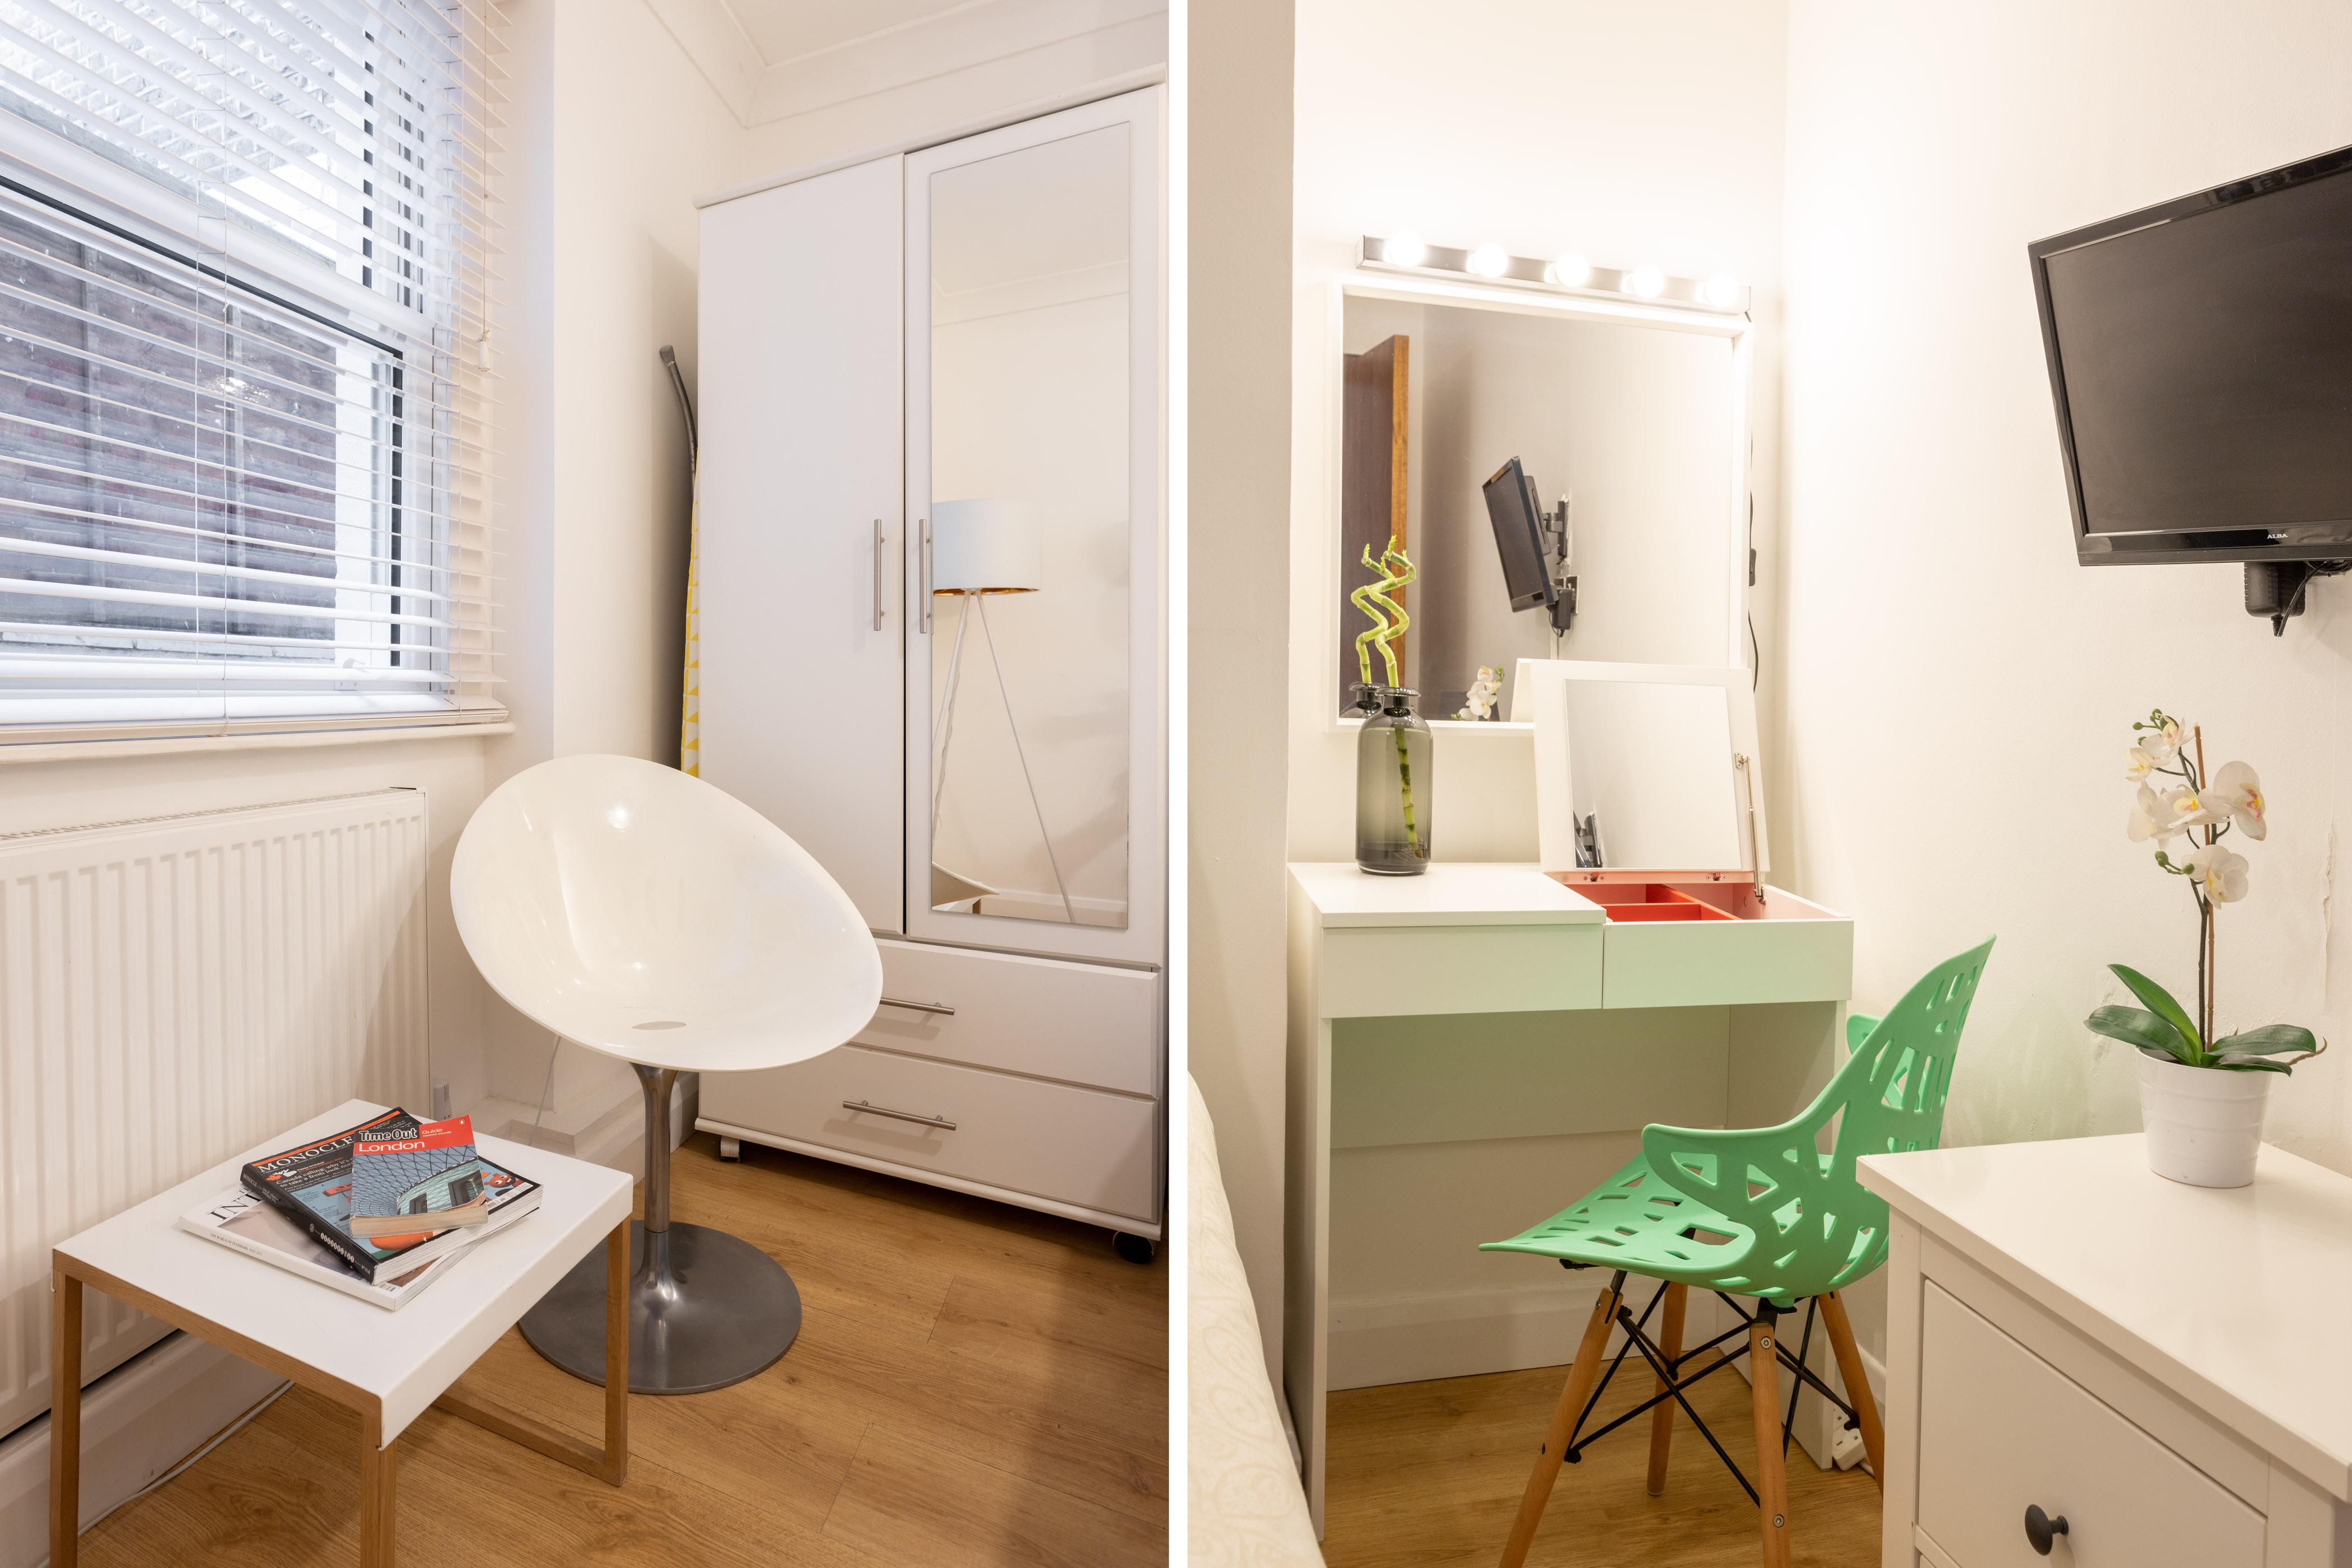 King's Cross Eurostar Double Room - Shared Bathroom - Shared Kitchen (ROOM 4) photo 26059381